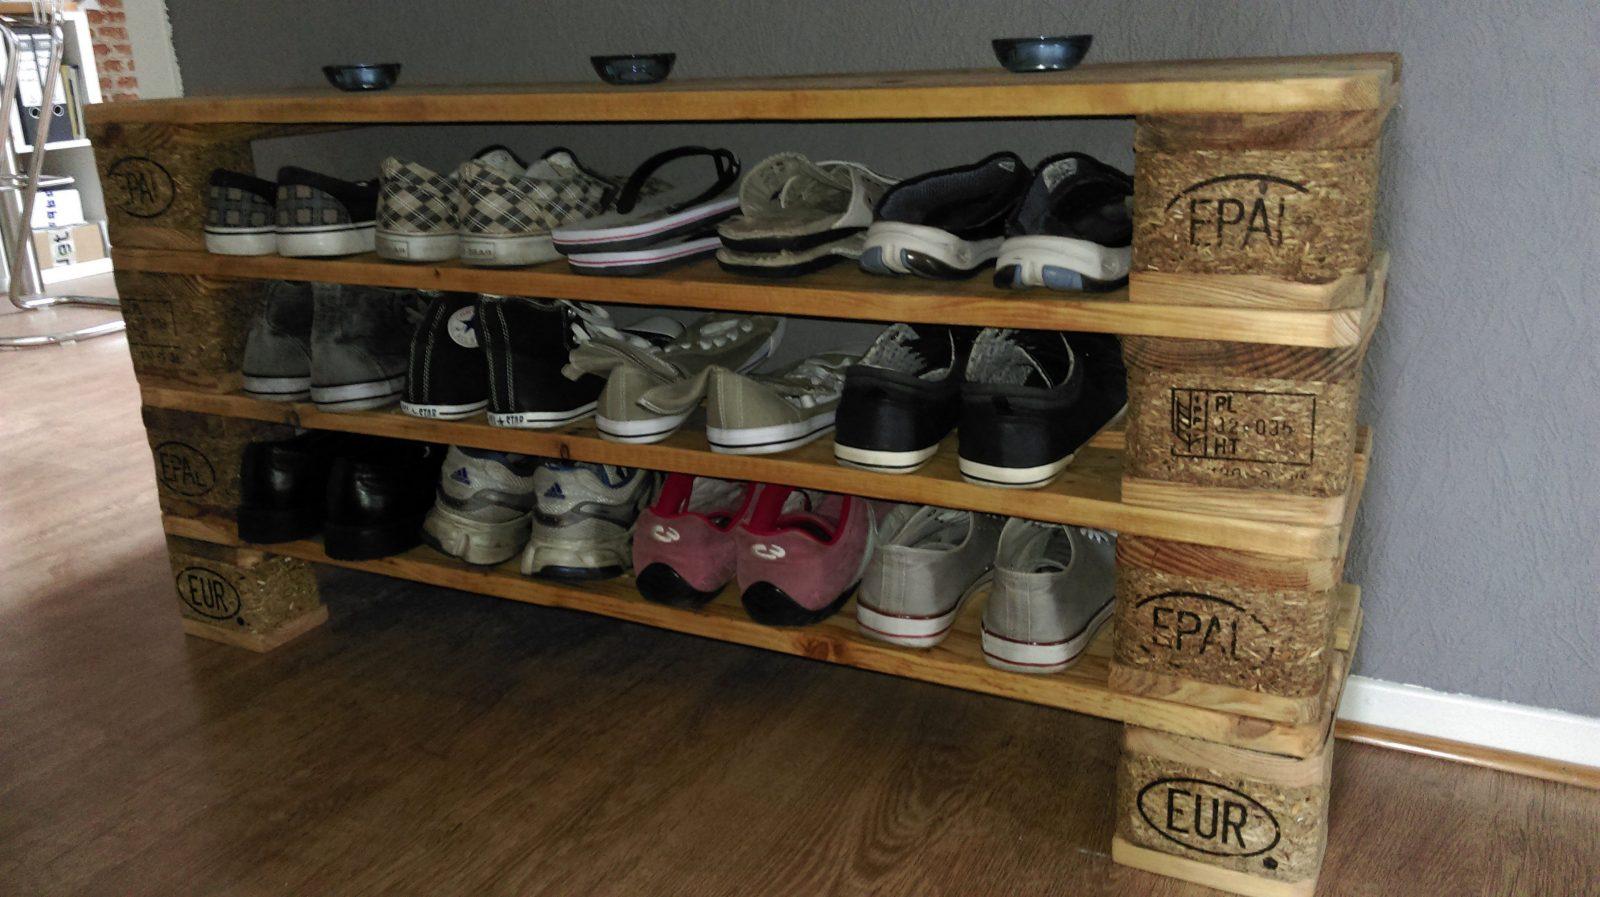 Stilvolle Schuhregal Selber Machen Schuhregal Aus Holz Selber Bauen von Schuhregal Selber Bauen Bauanleitung Bild